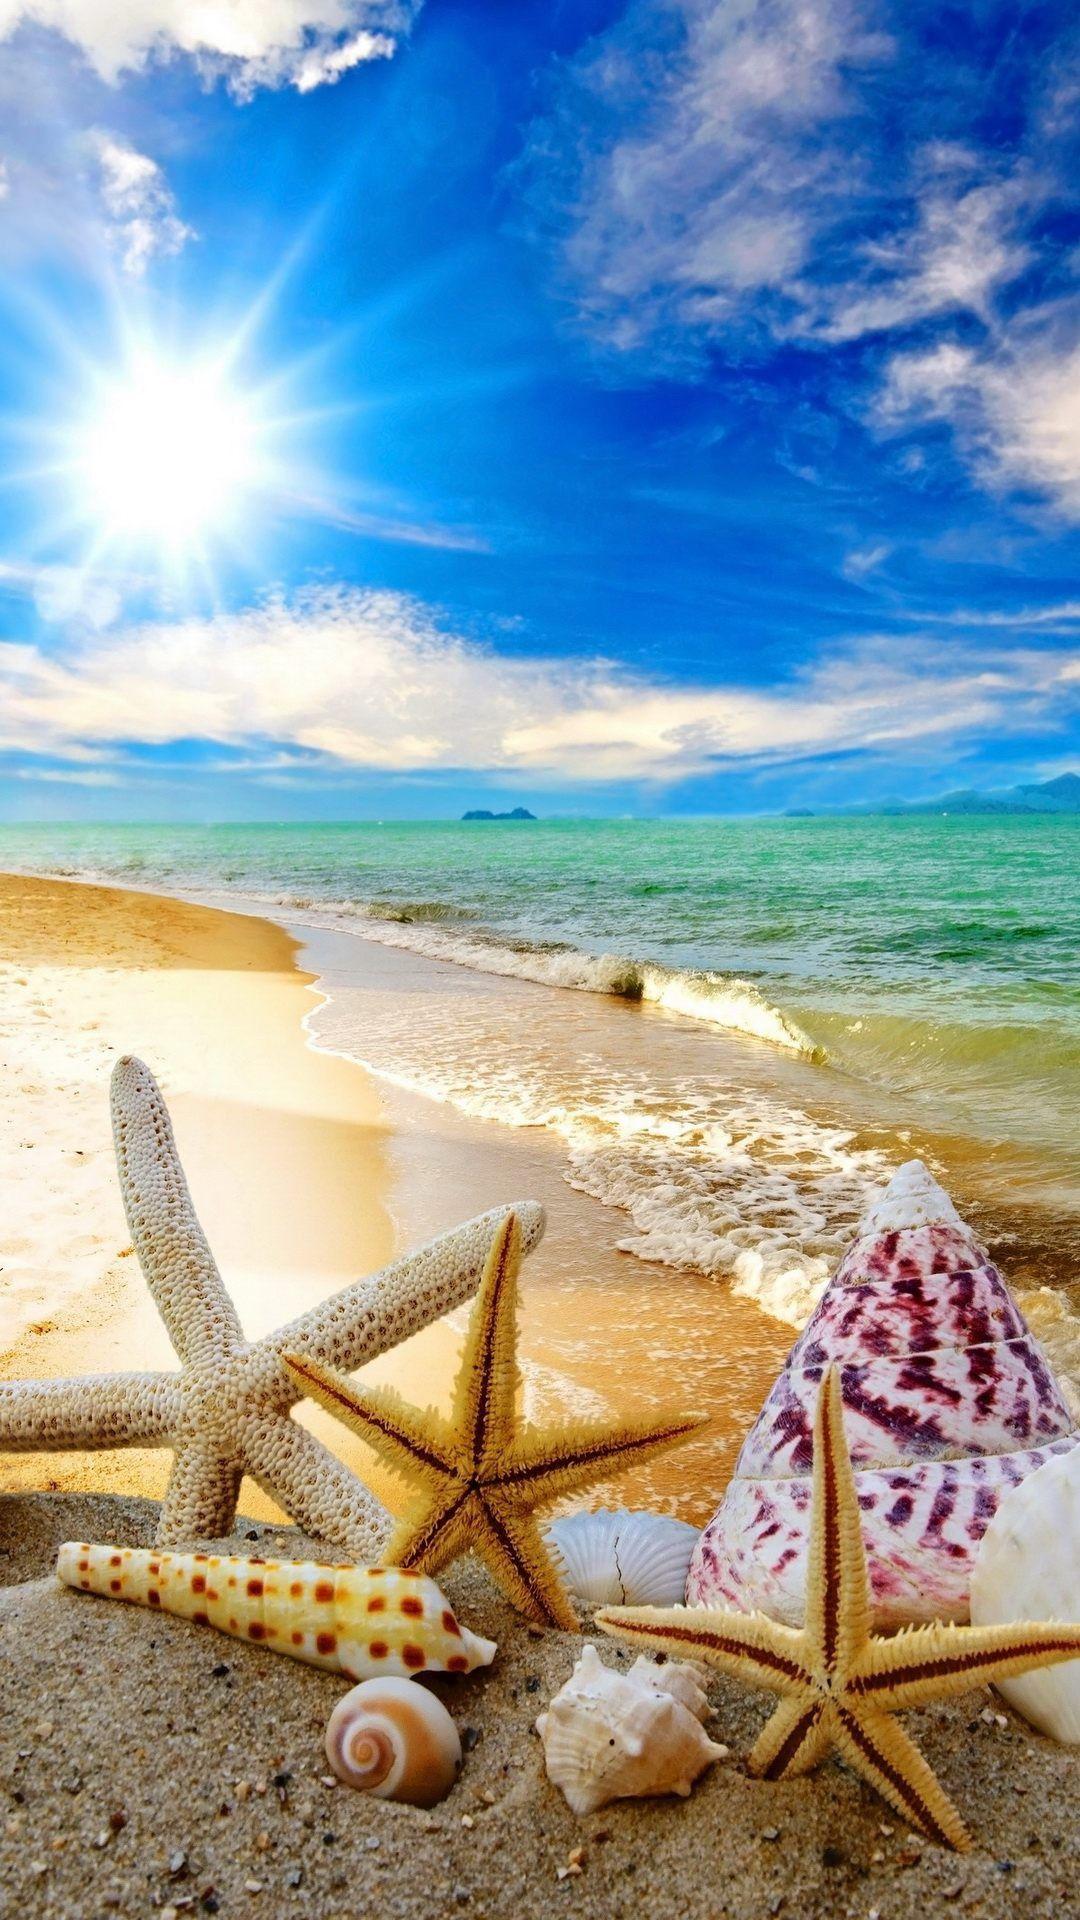 summer beach sun starfish waves android wallpaper hd | cool